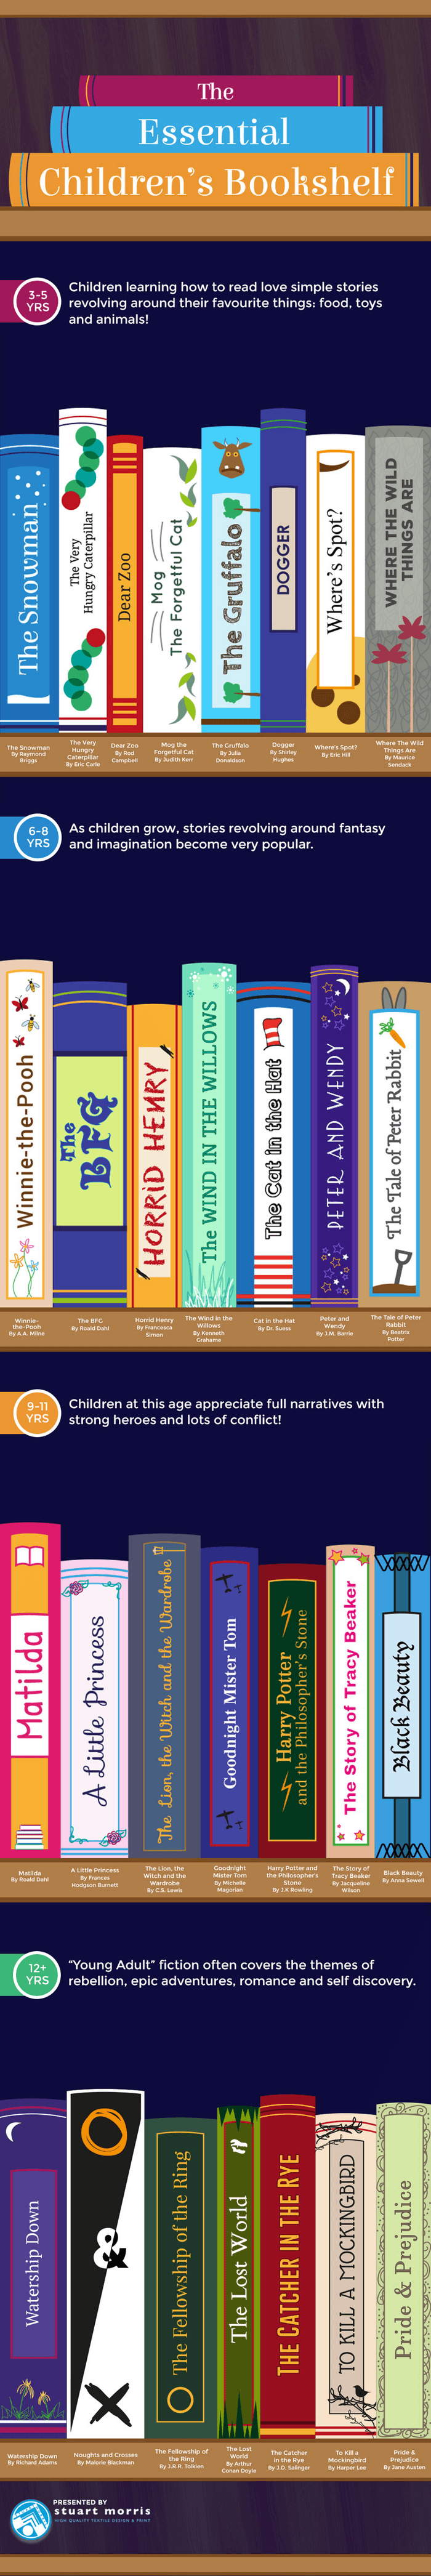 Stuart Morris - The Essential Children's Bookshelf - Infographic